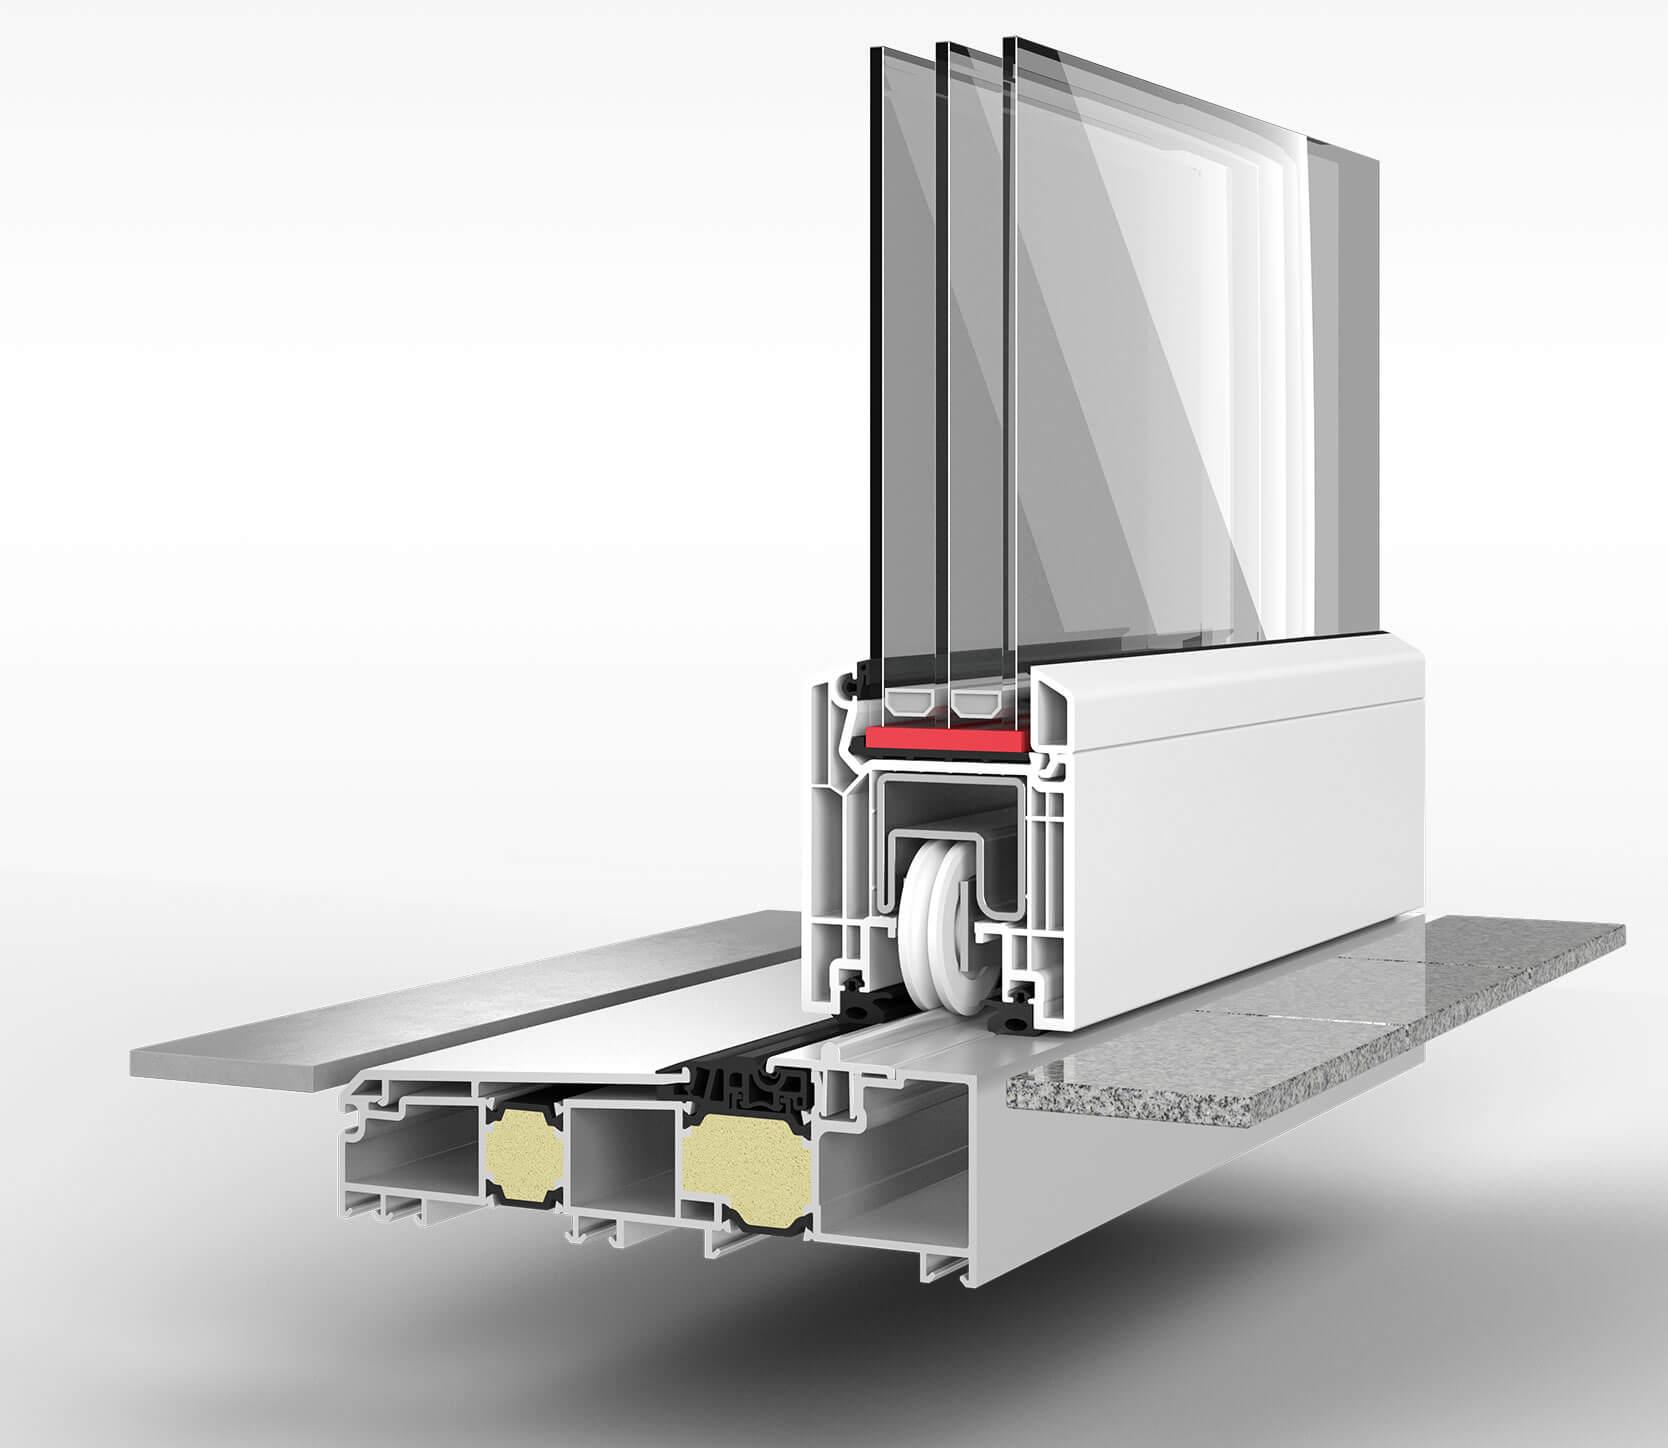 3D Visualisierung Fenster Schnitt